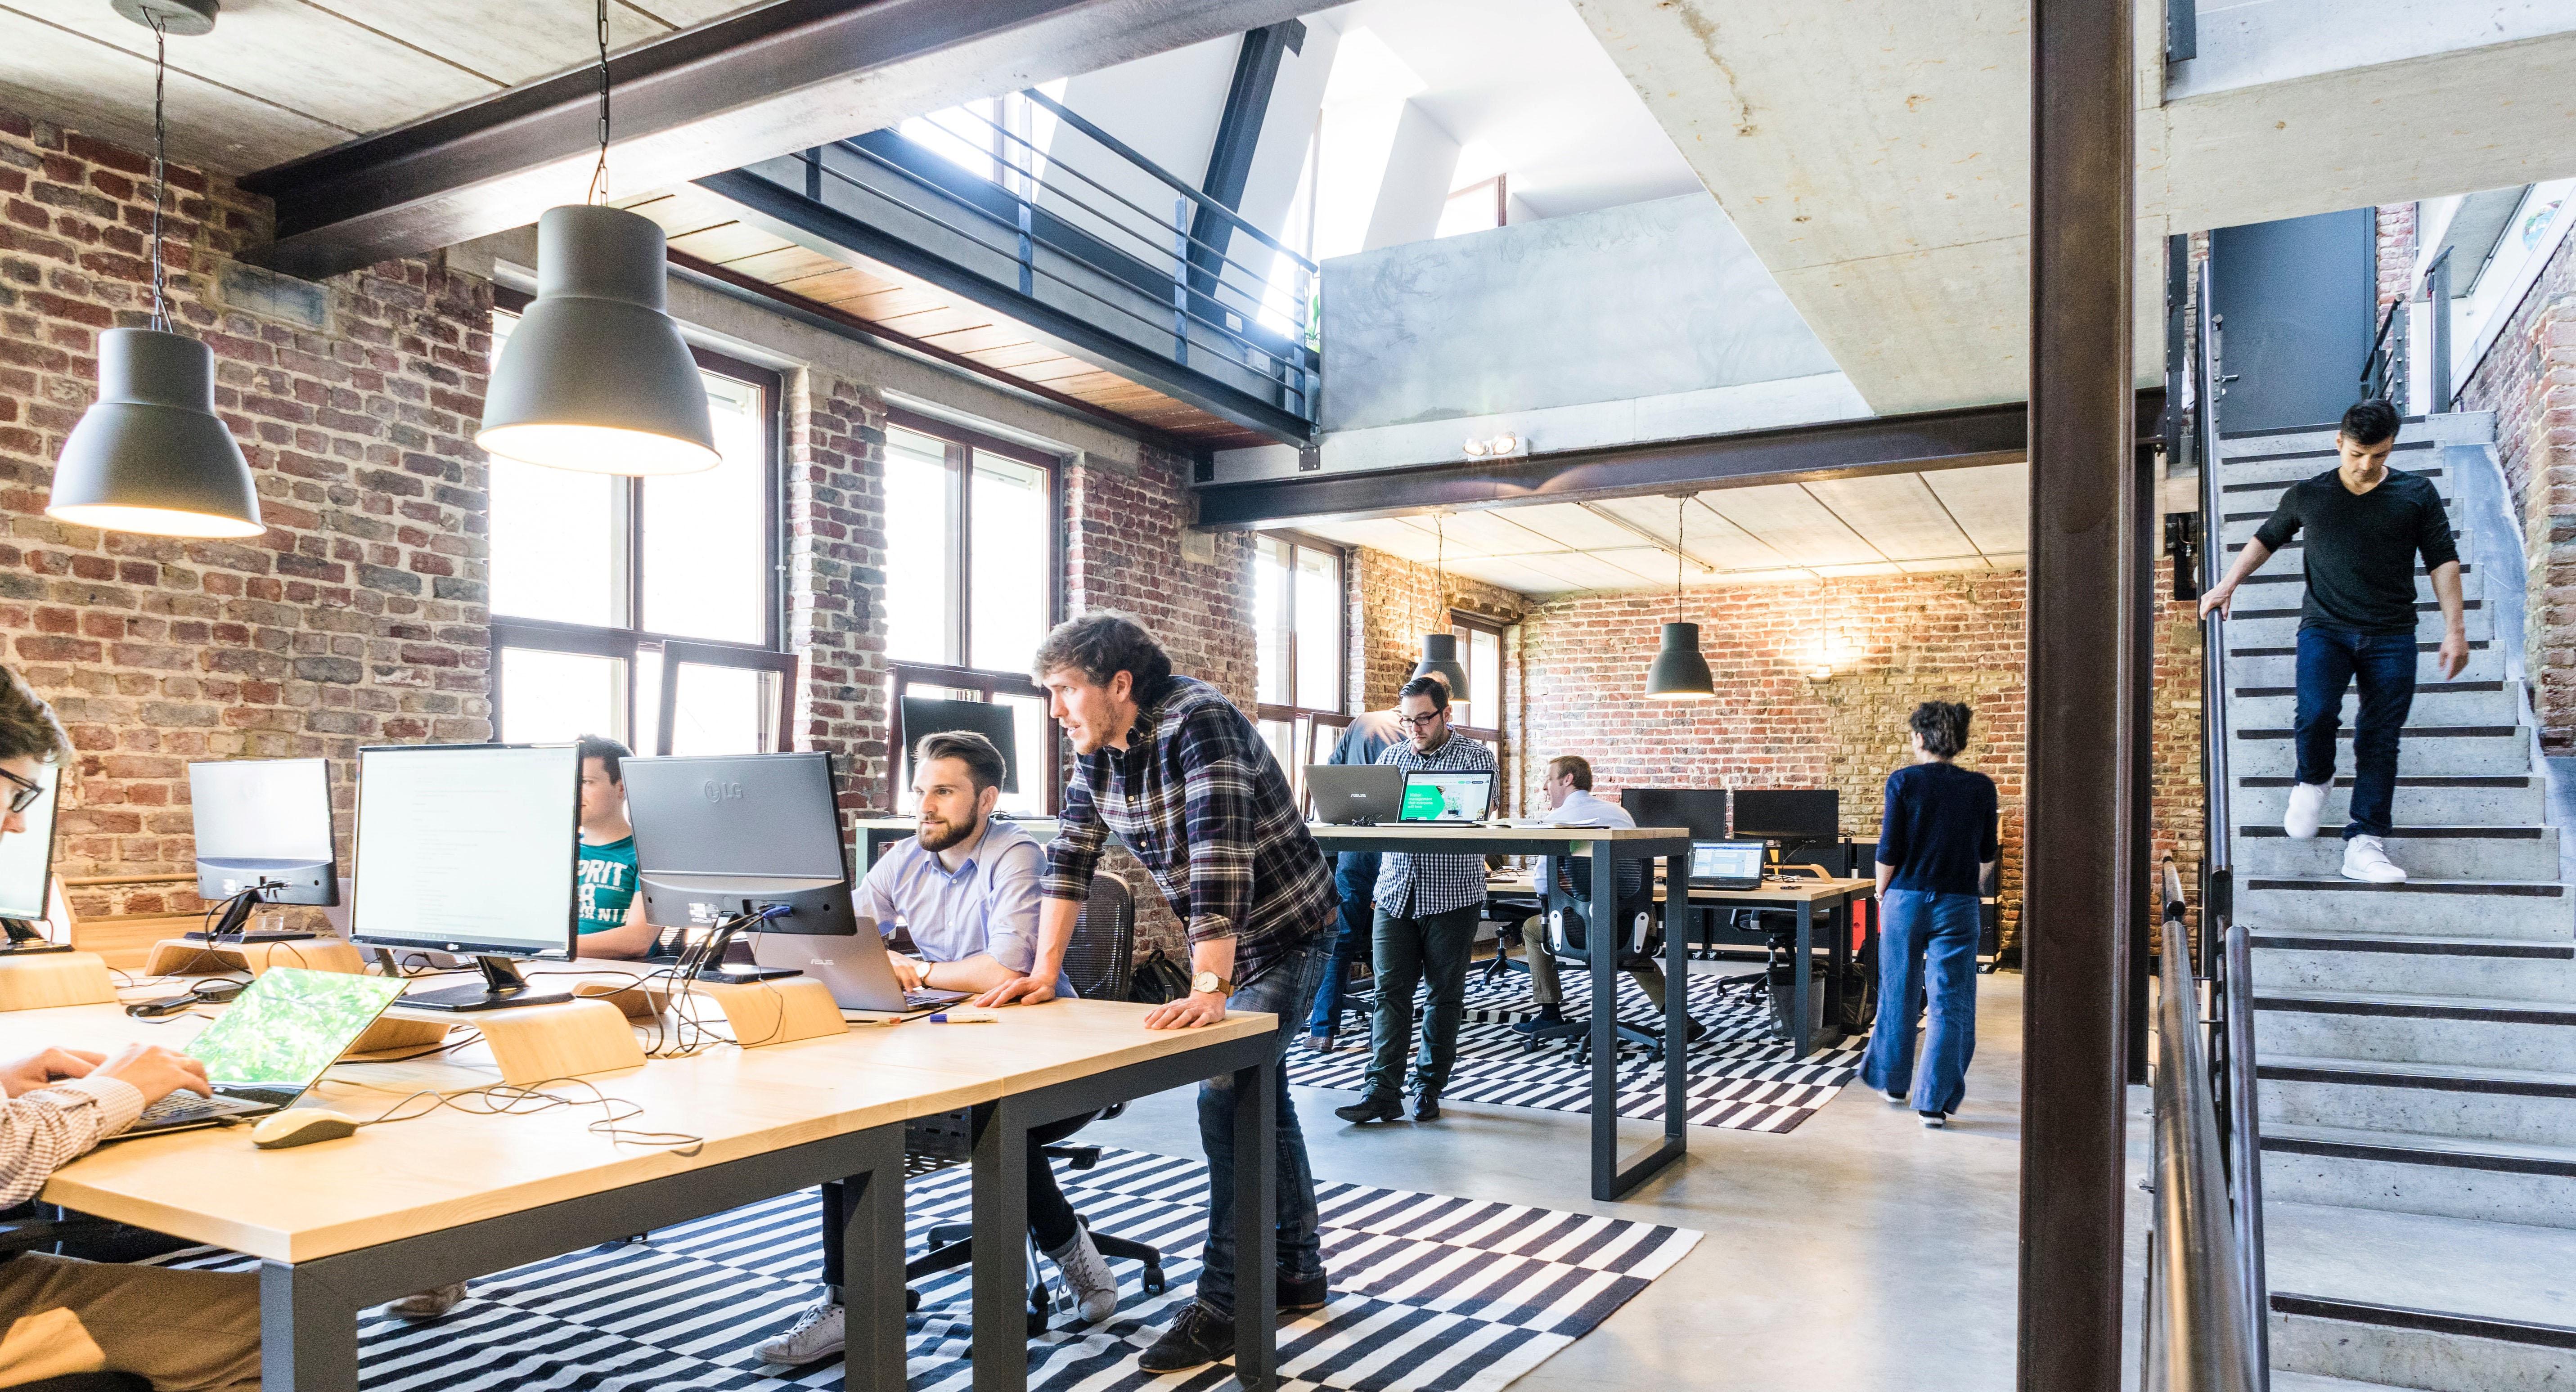 5 Common Mistakes Startups Make